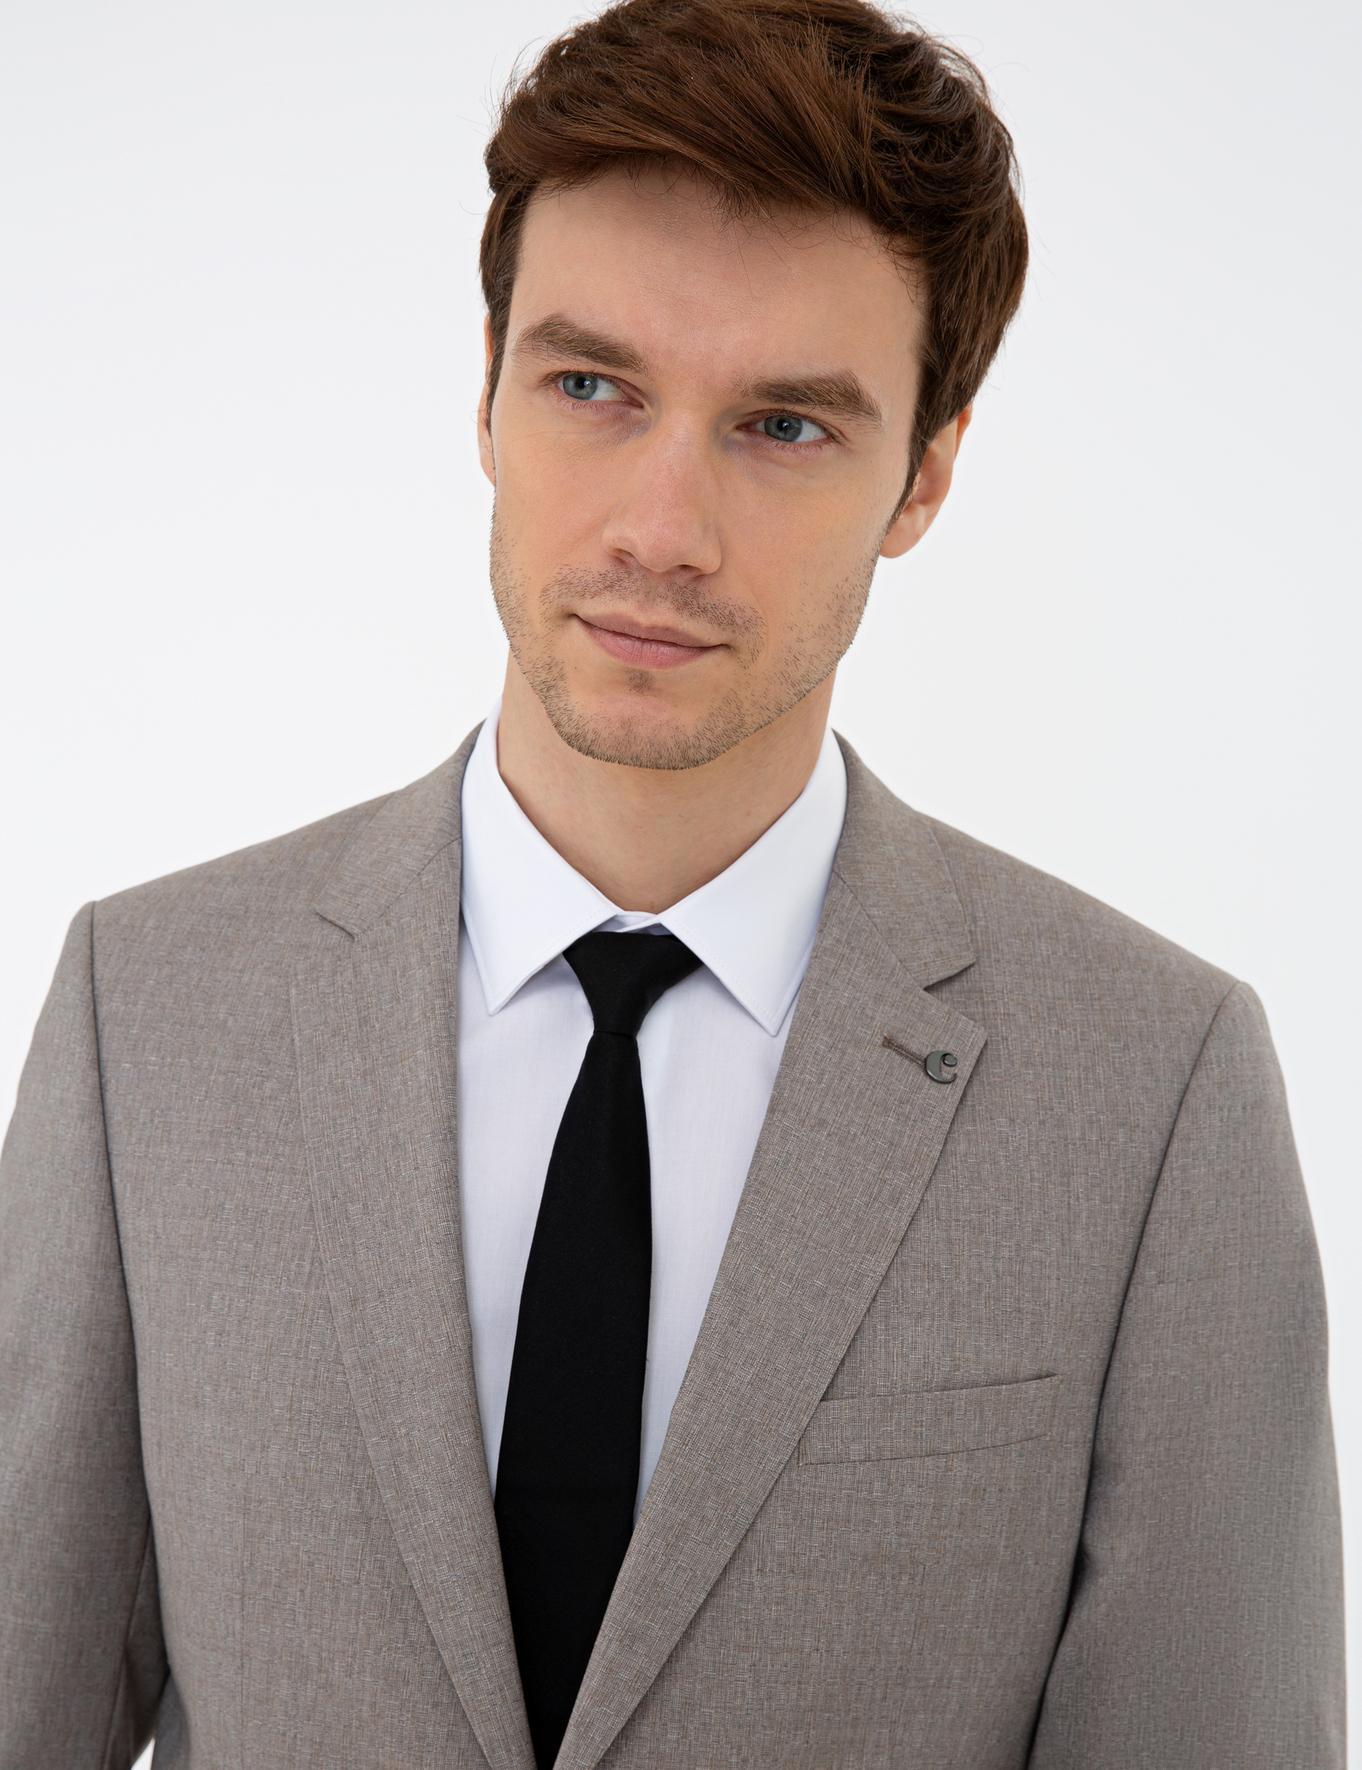 Bej Slim Fit Takım Elbise - 50233434086